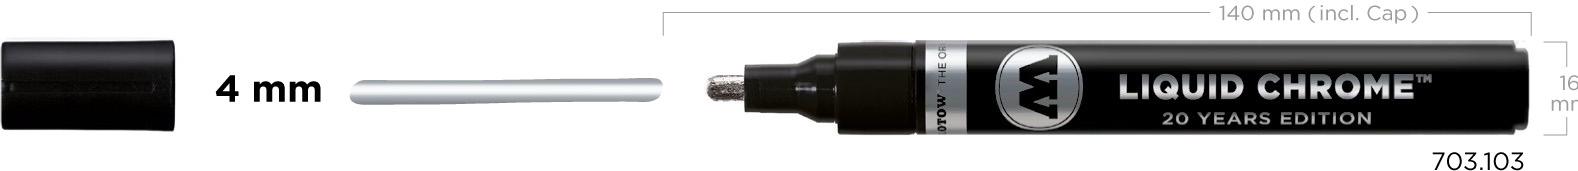 Liqiud chrome - fixka  hrot 4 mm